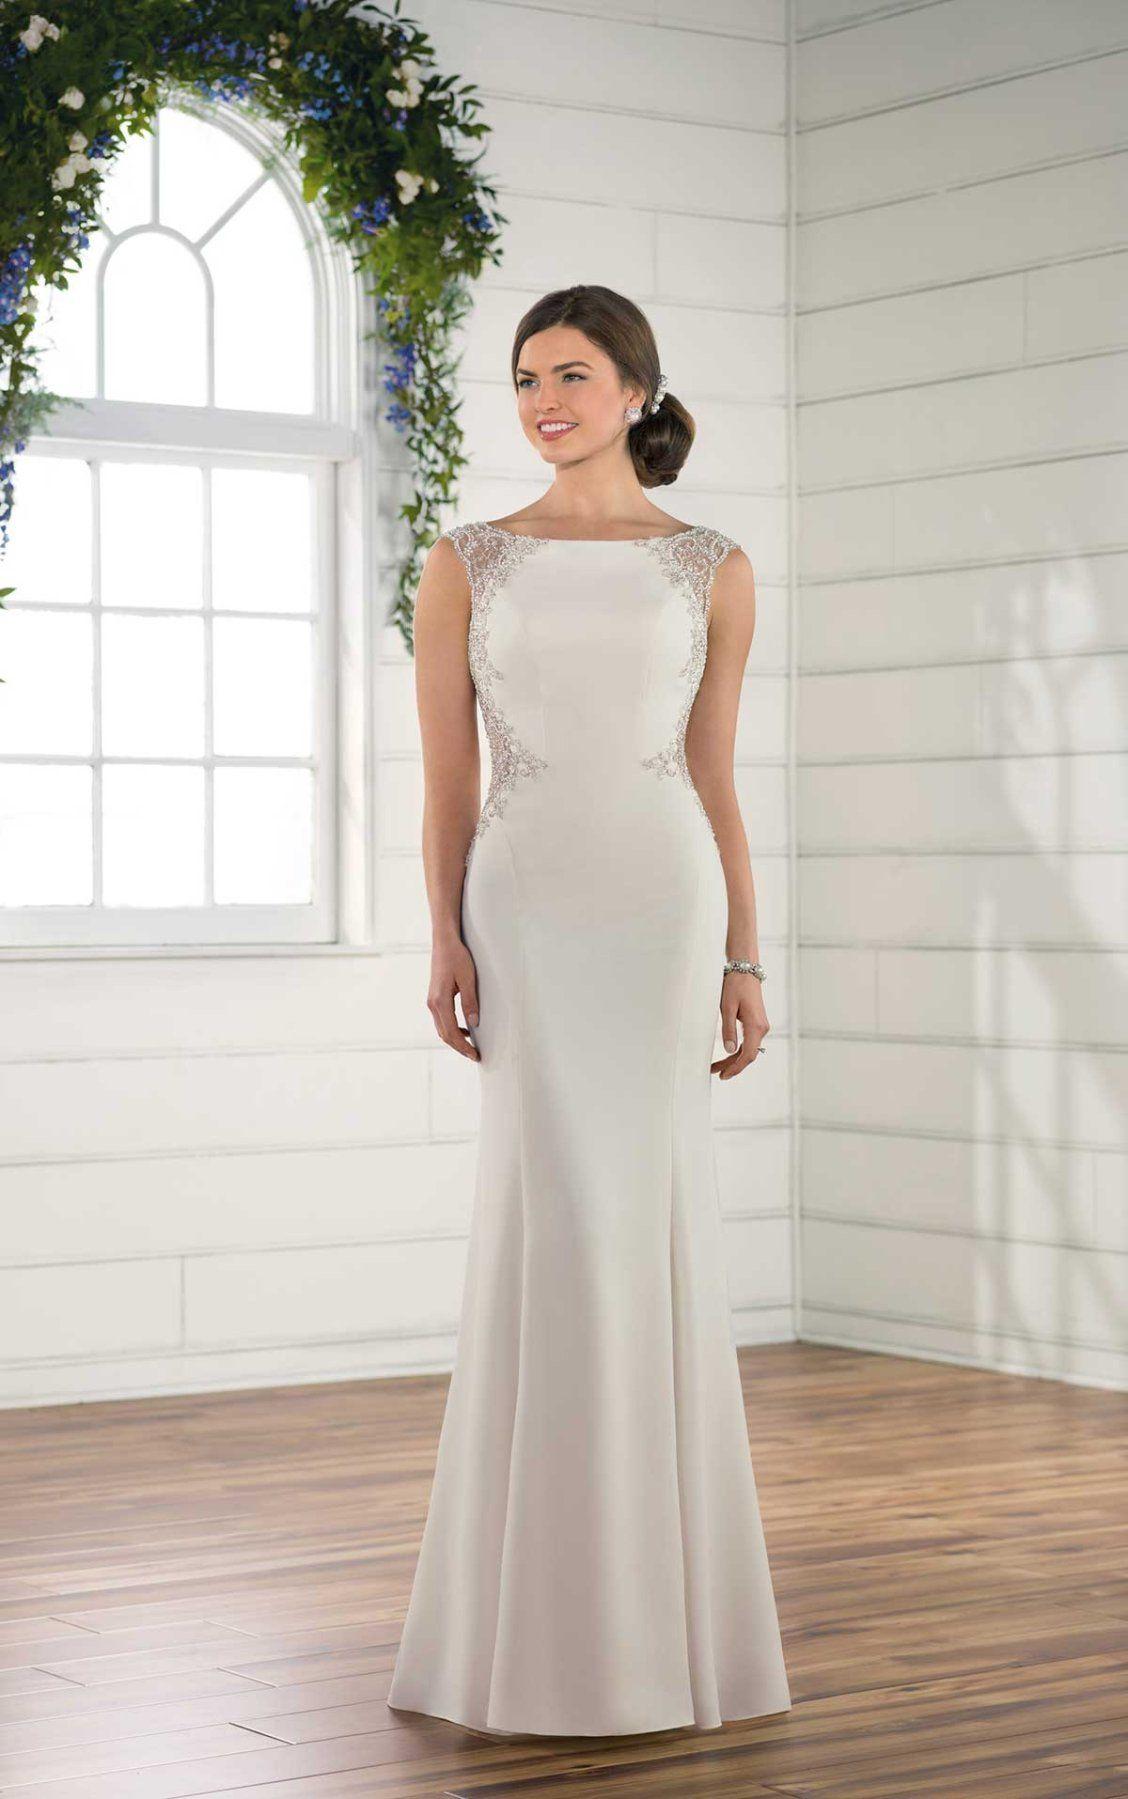 Boho lace patterned wedding dress vintage glamour wedding dress